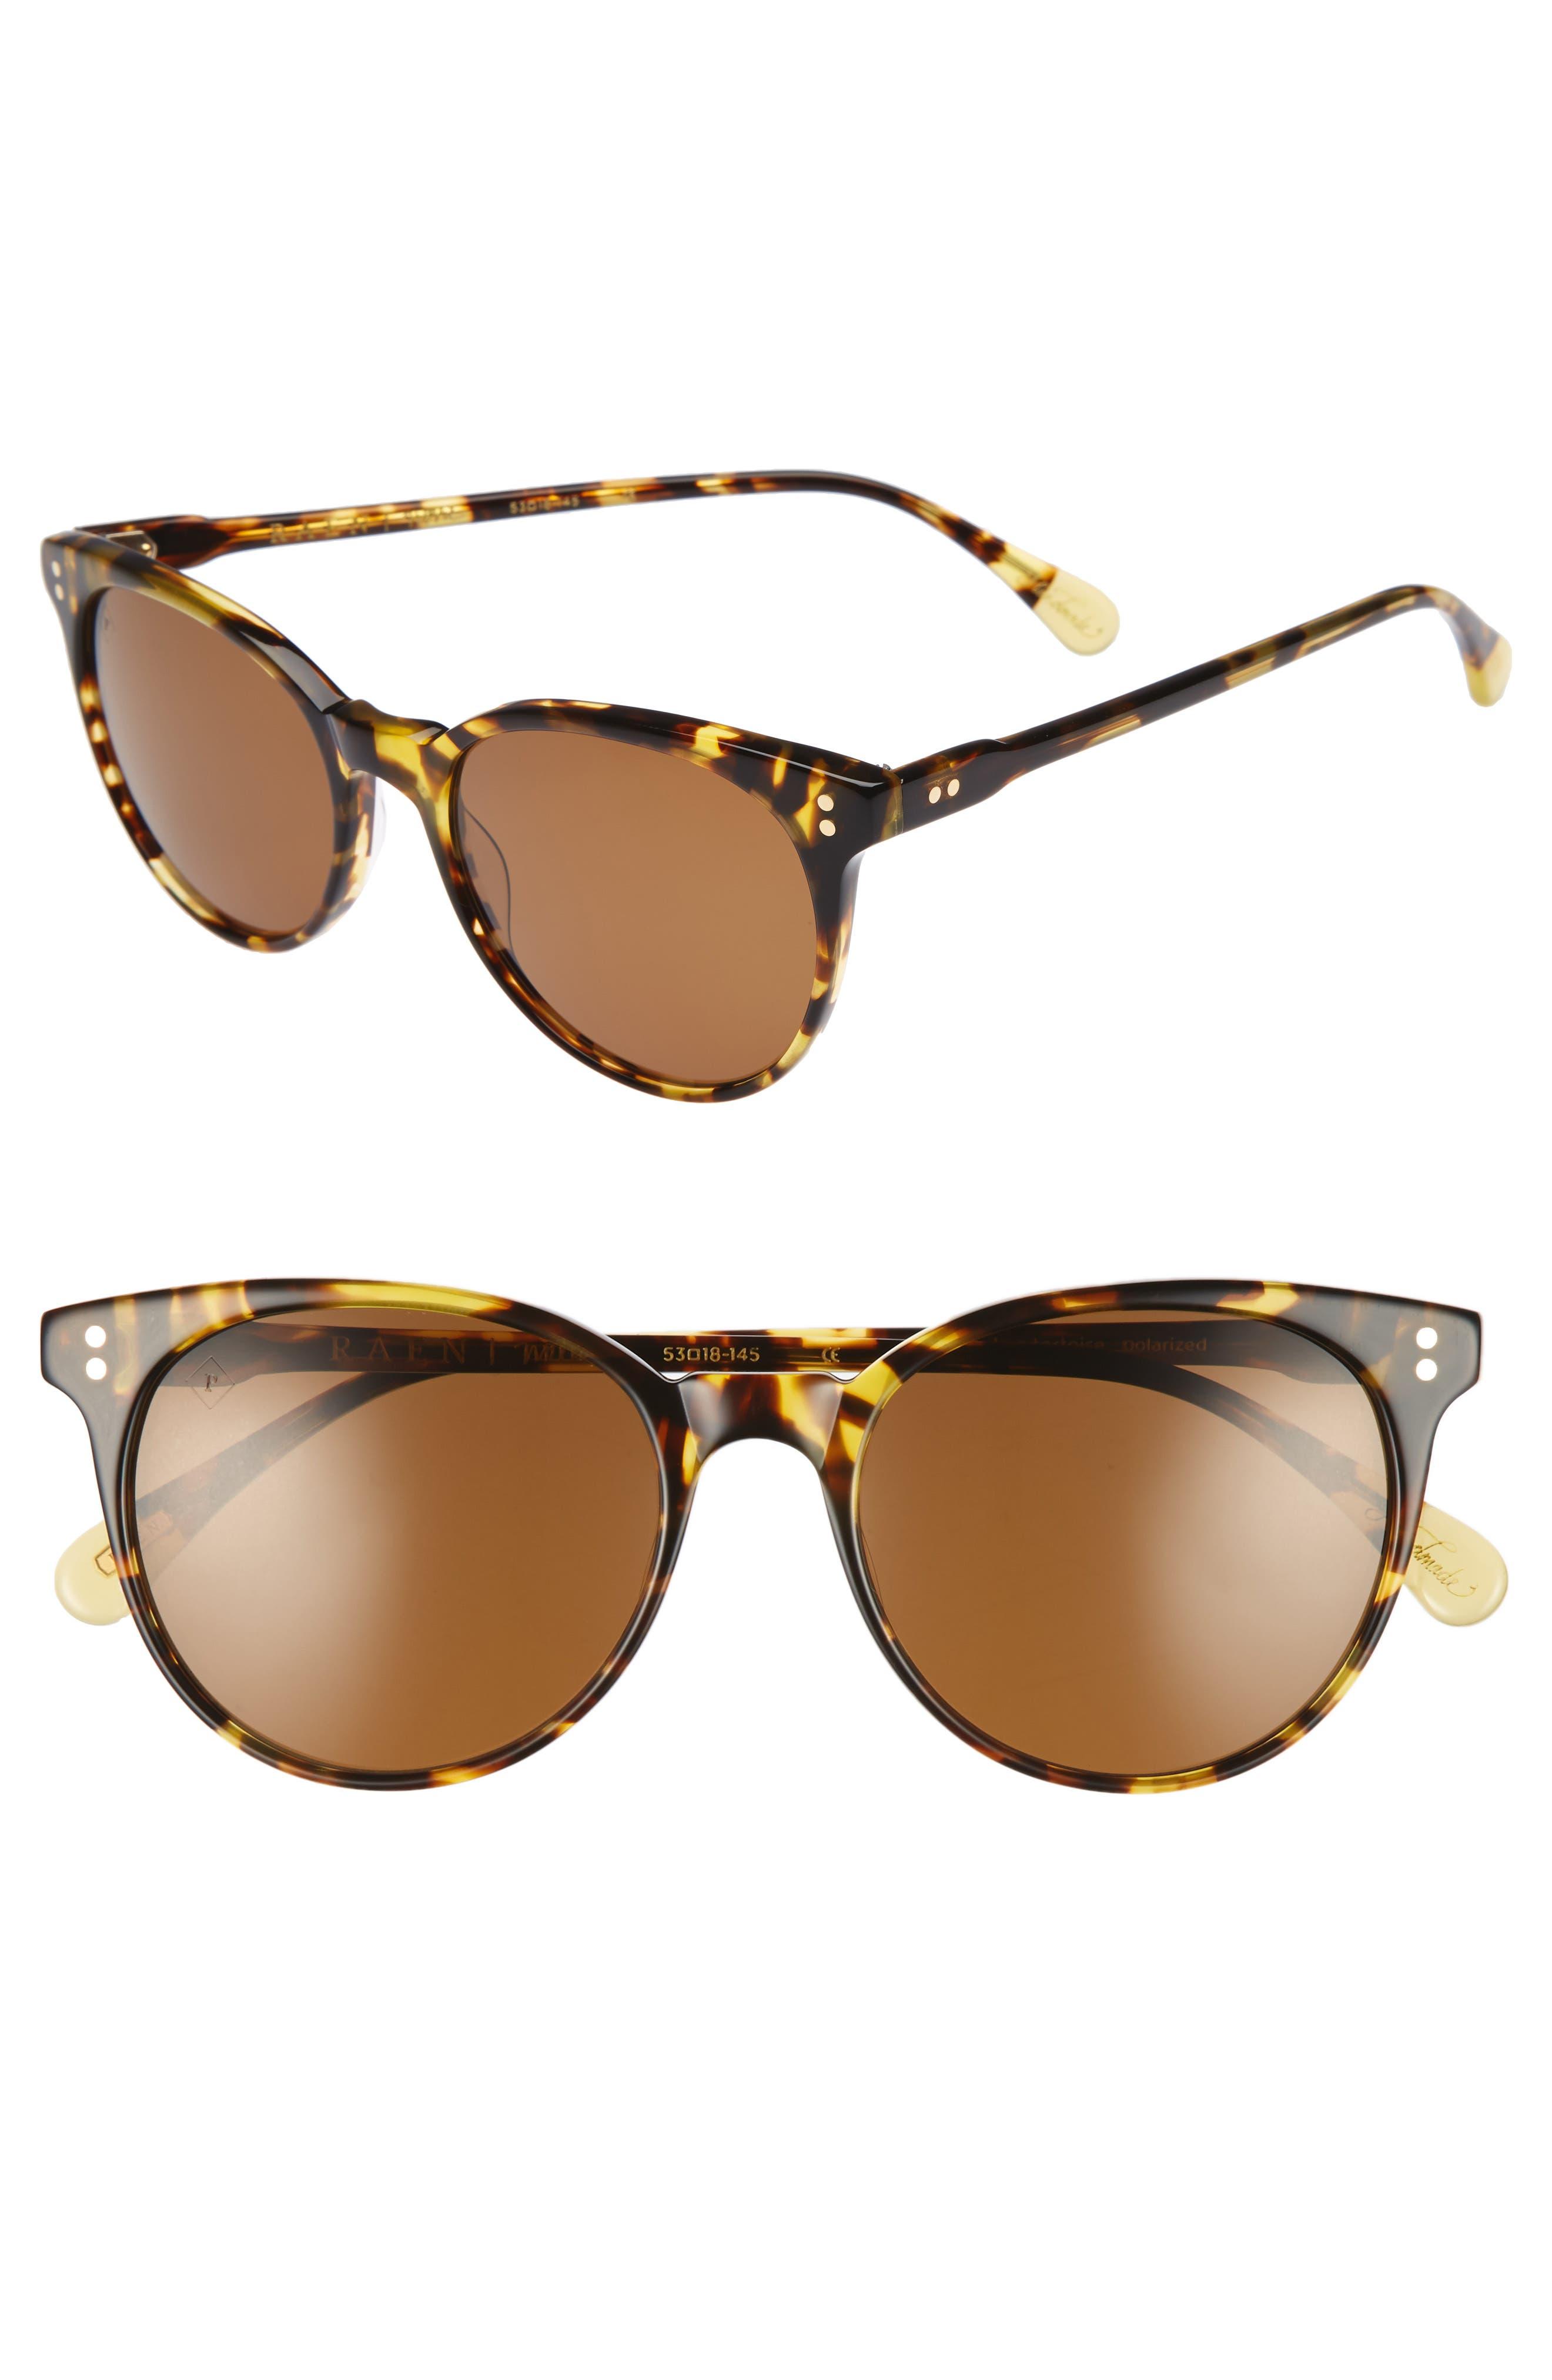 Main Image - RAEN Norie 53mm Sunglasses